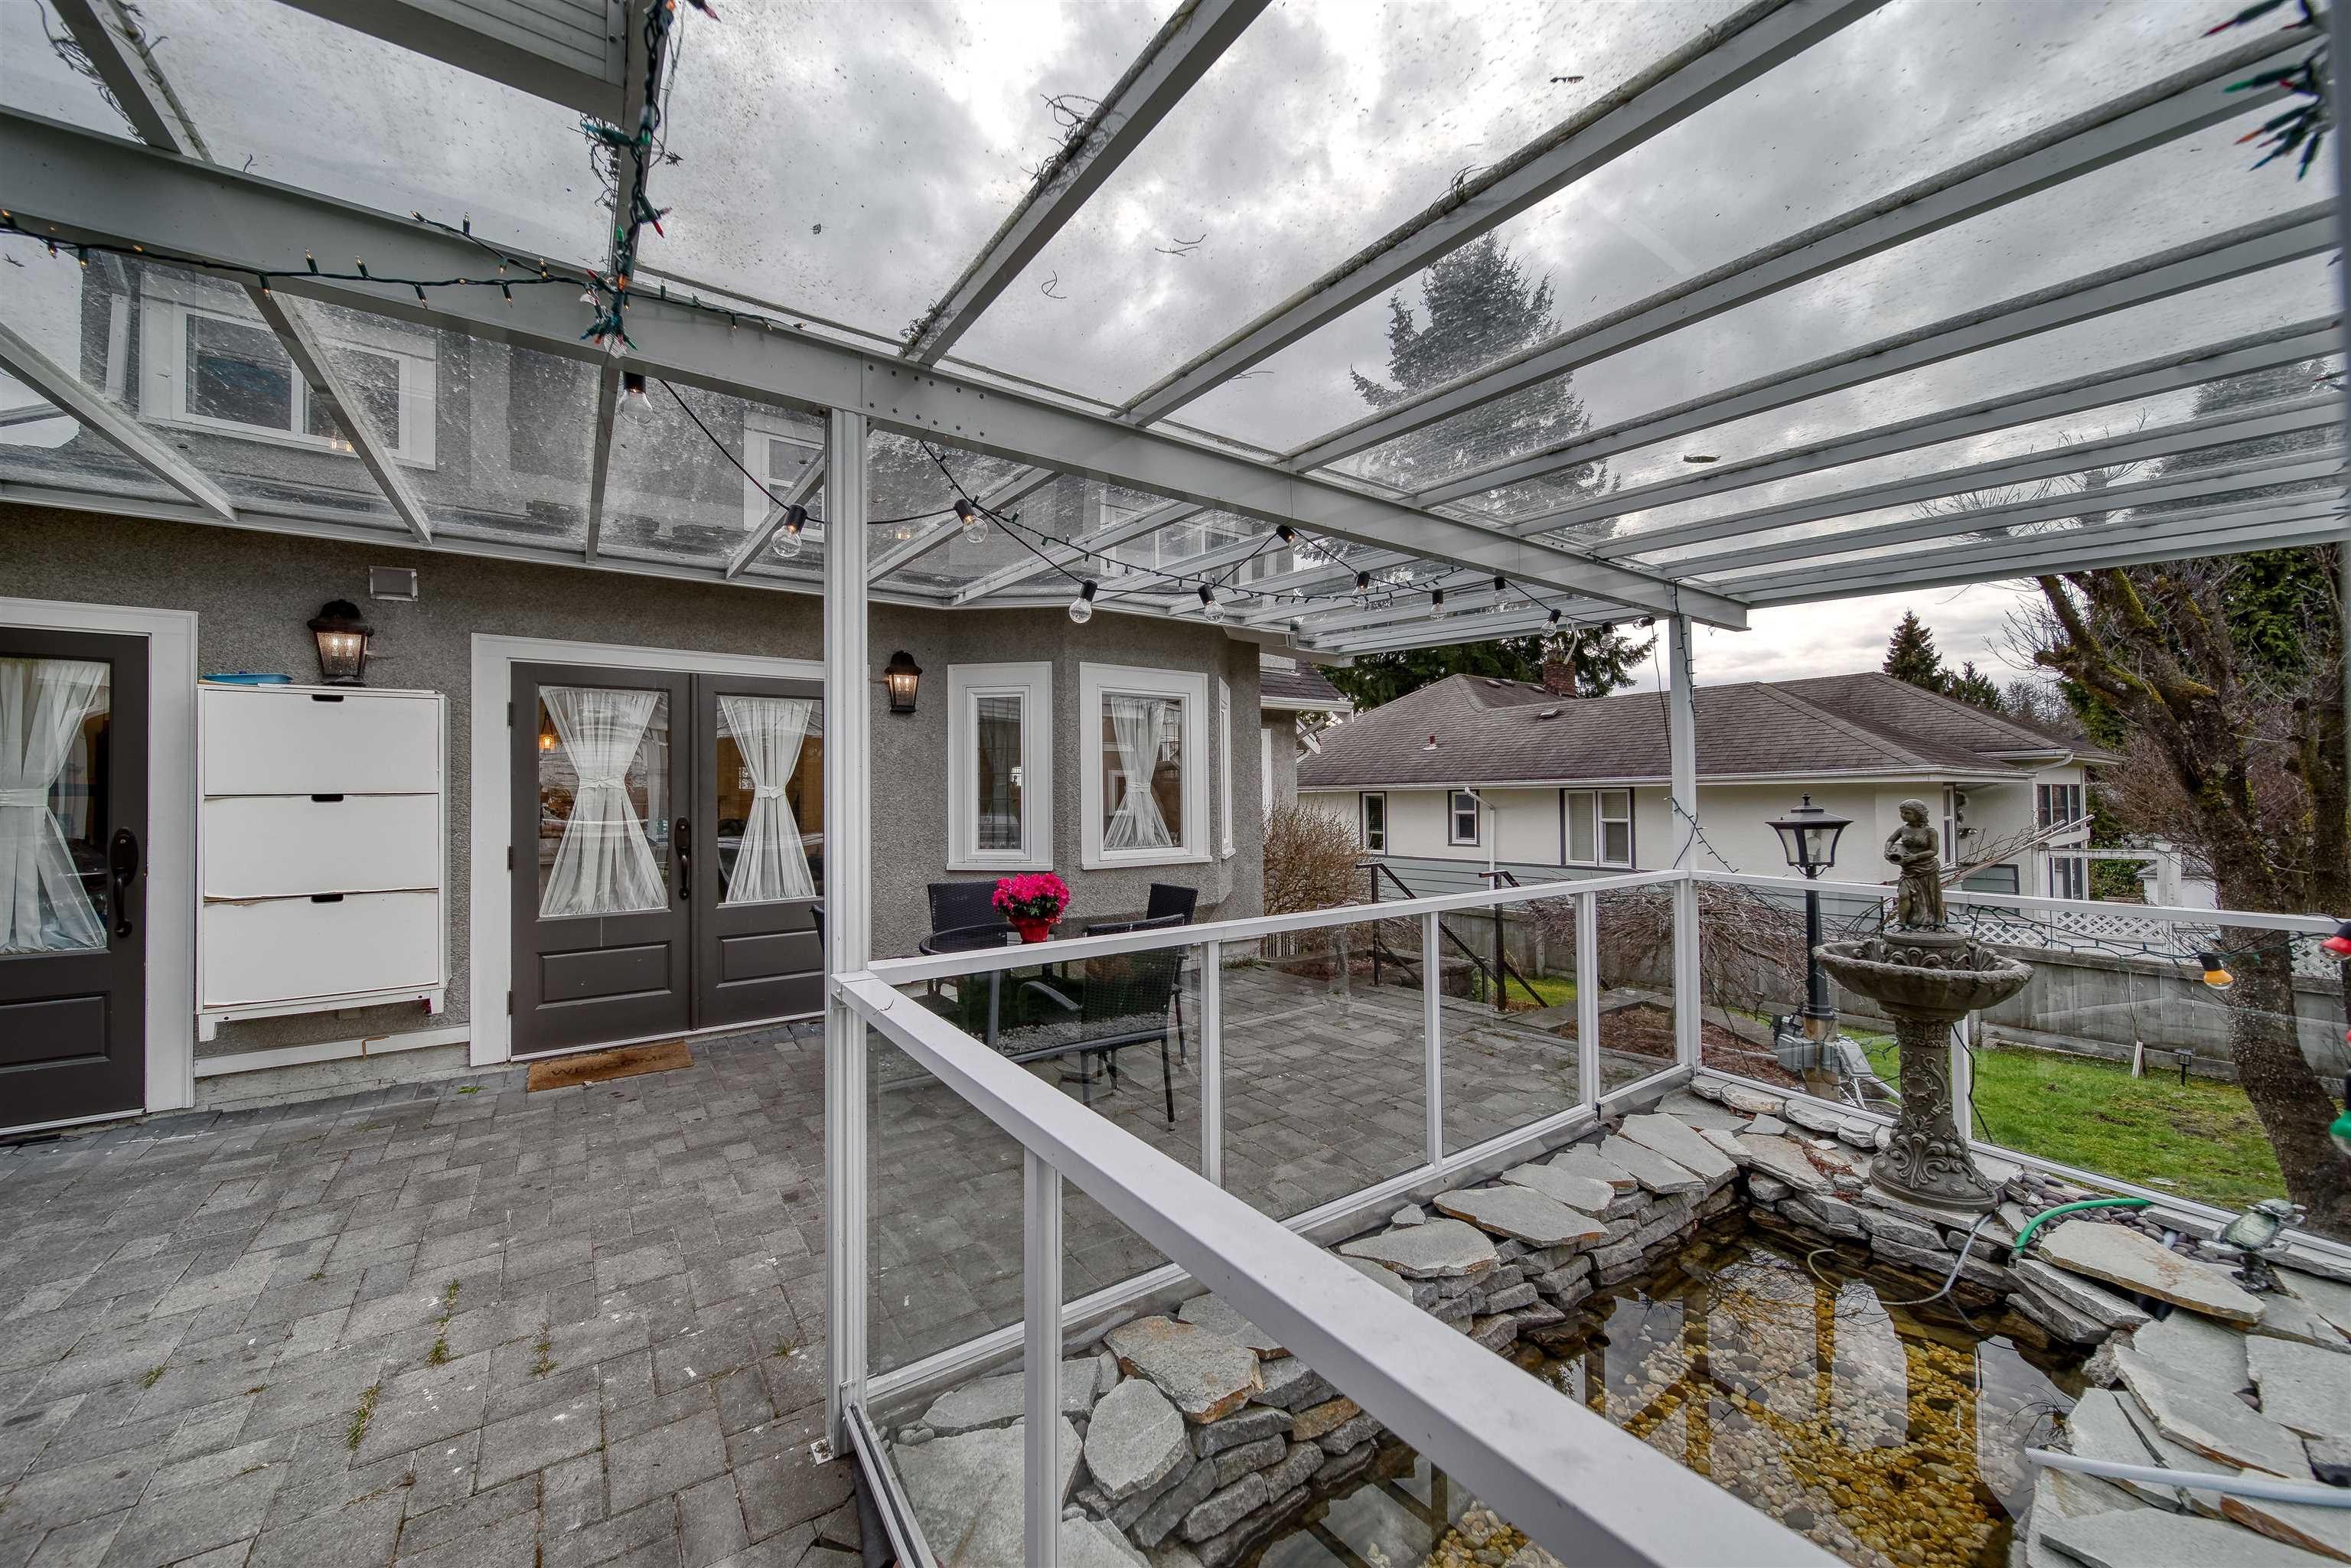 1357 FULTON AVENUE - Ambleside House/Single Family for sale, 6 Bedrooms (R2617731) - #4